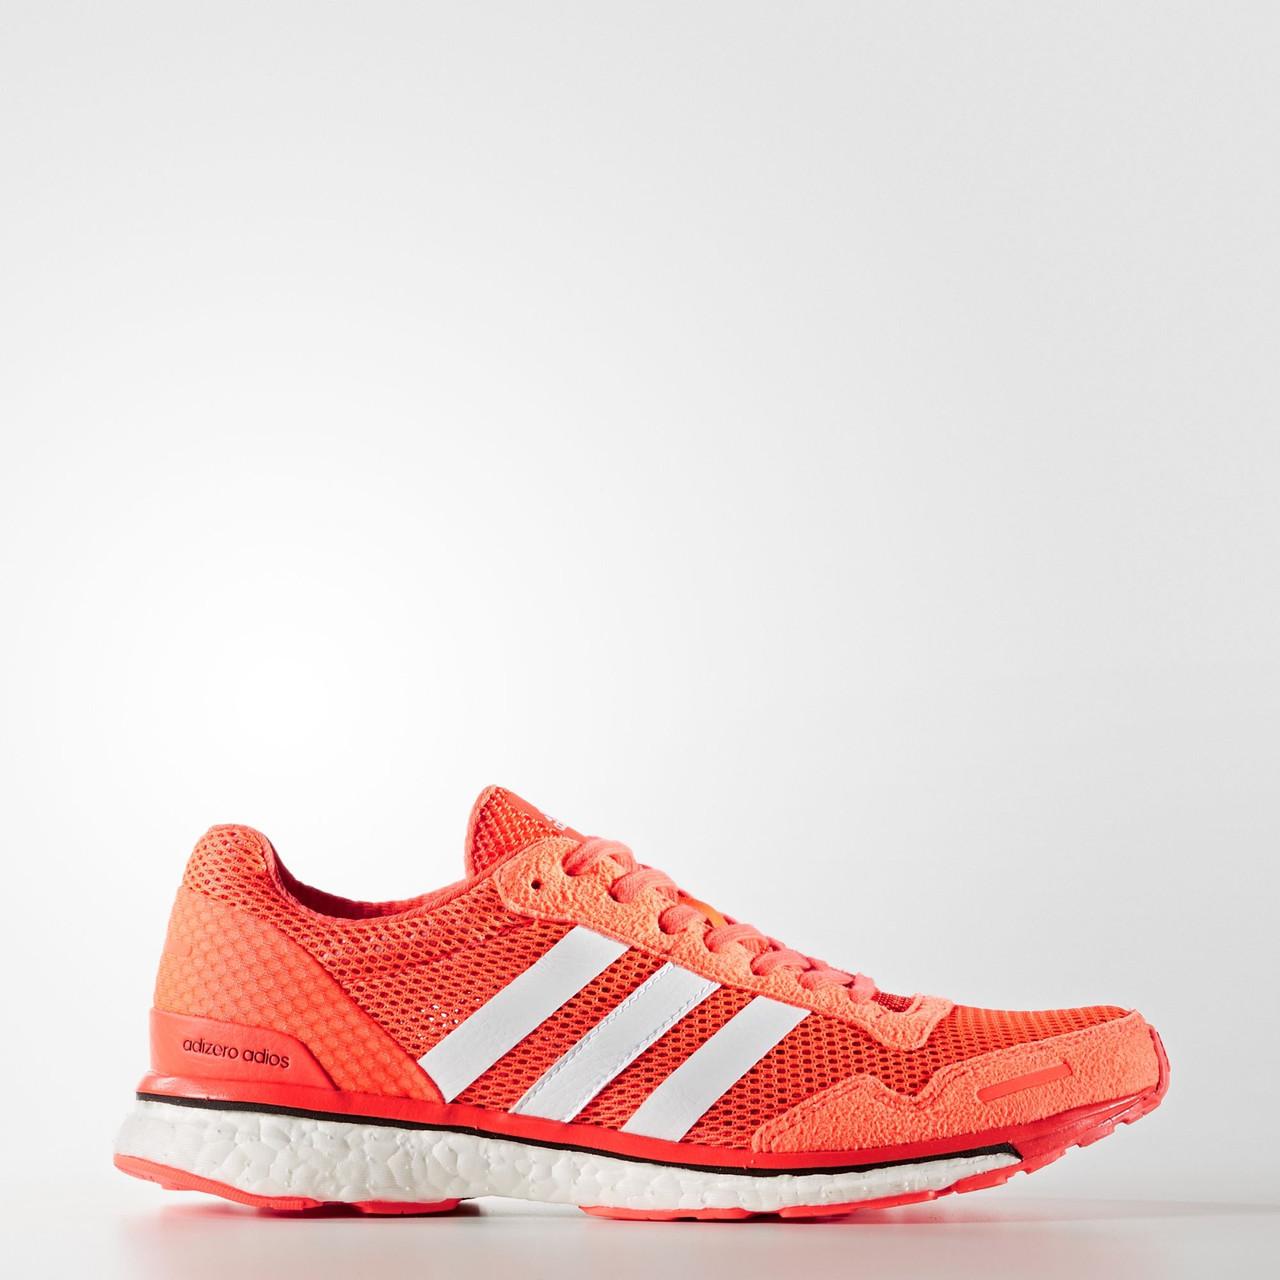 Кроссовки женские Adidas adizero Adios 3 W AQ2433